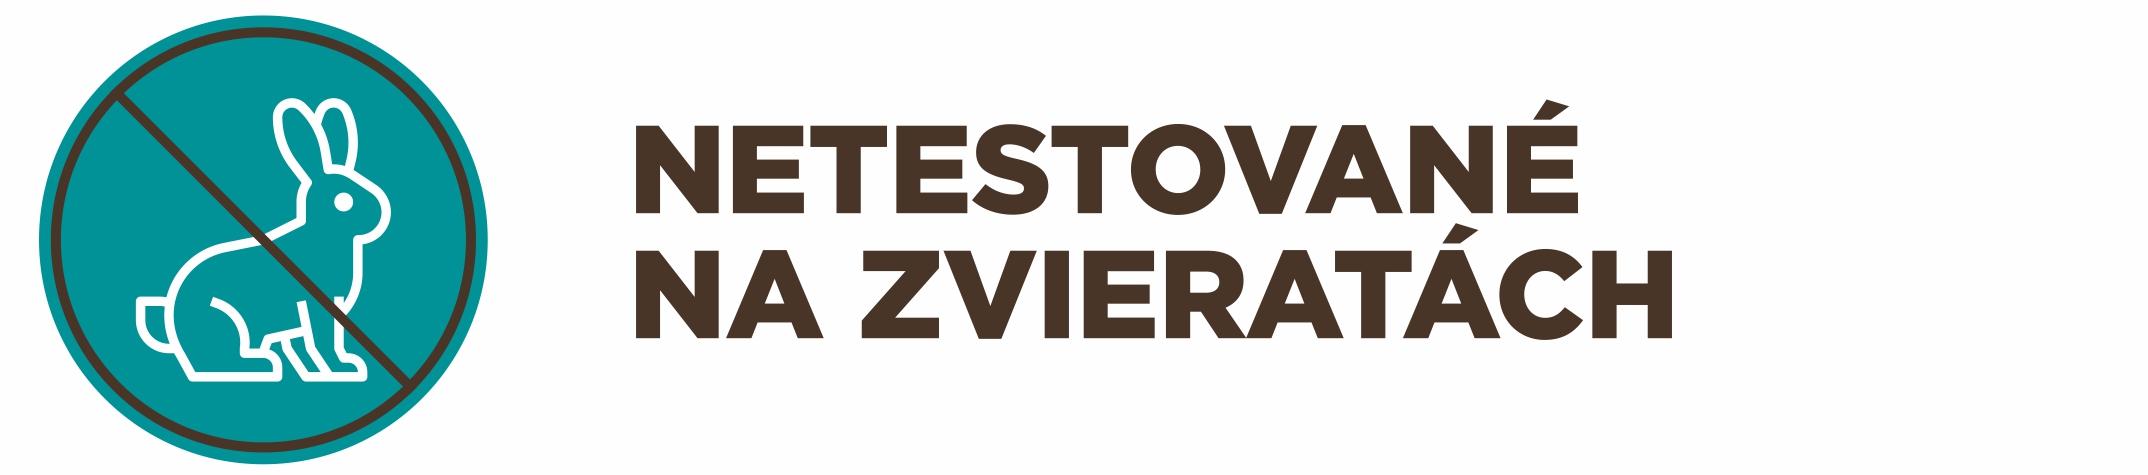 label_netestovane_na_zvieratach